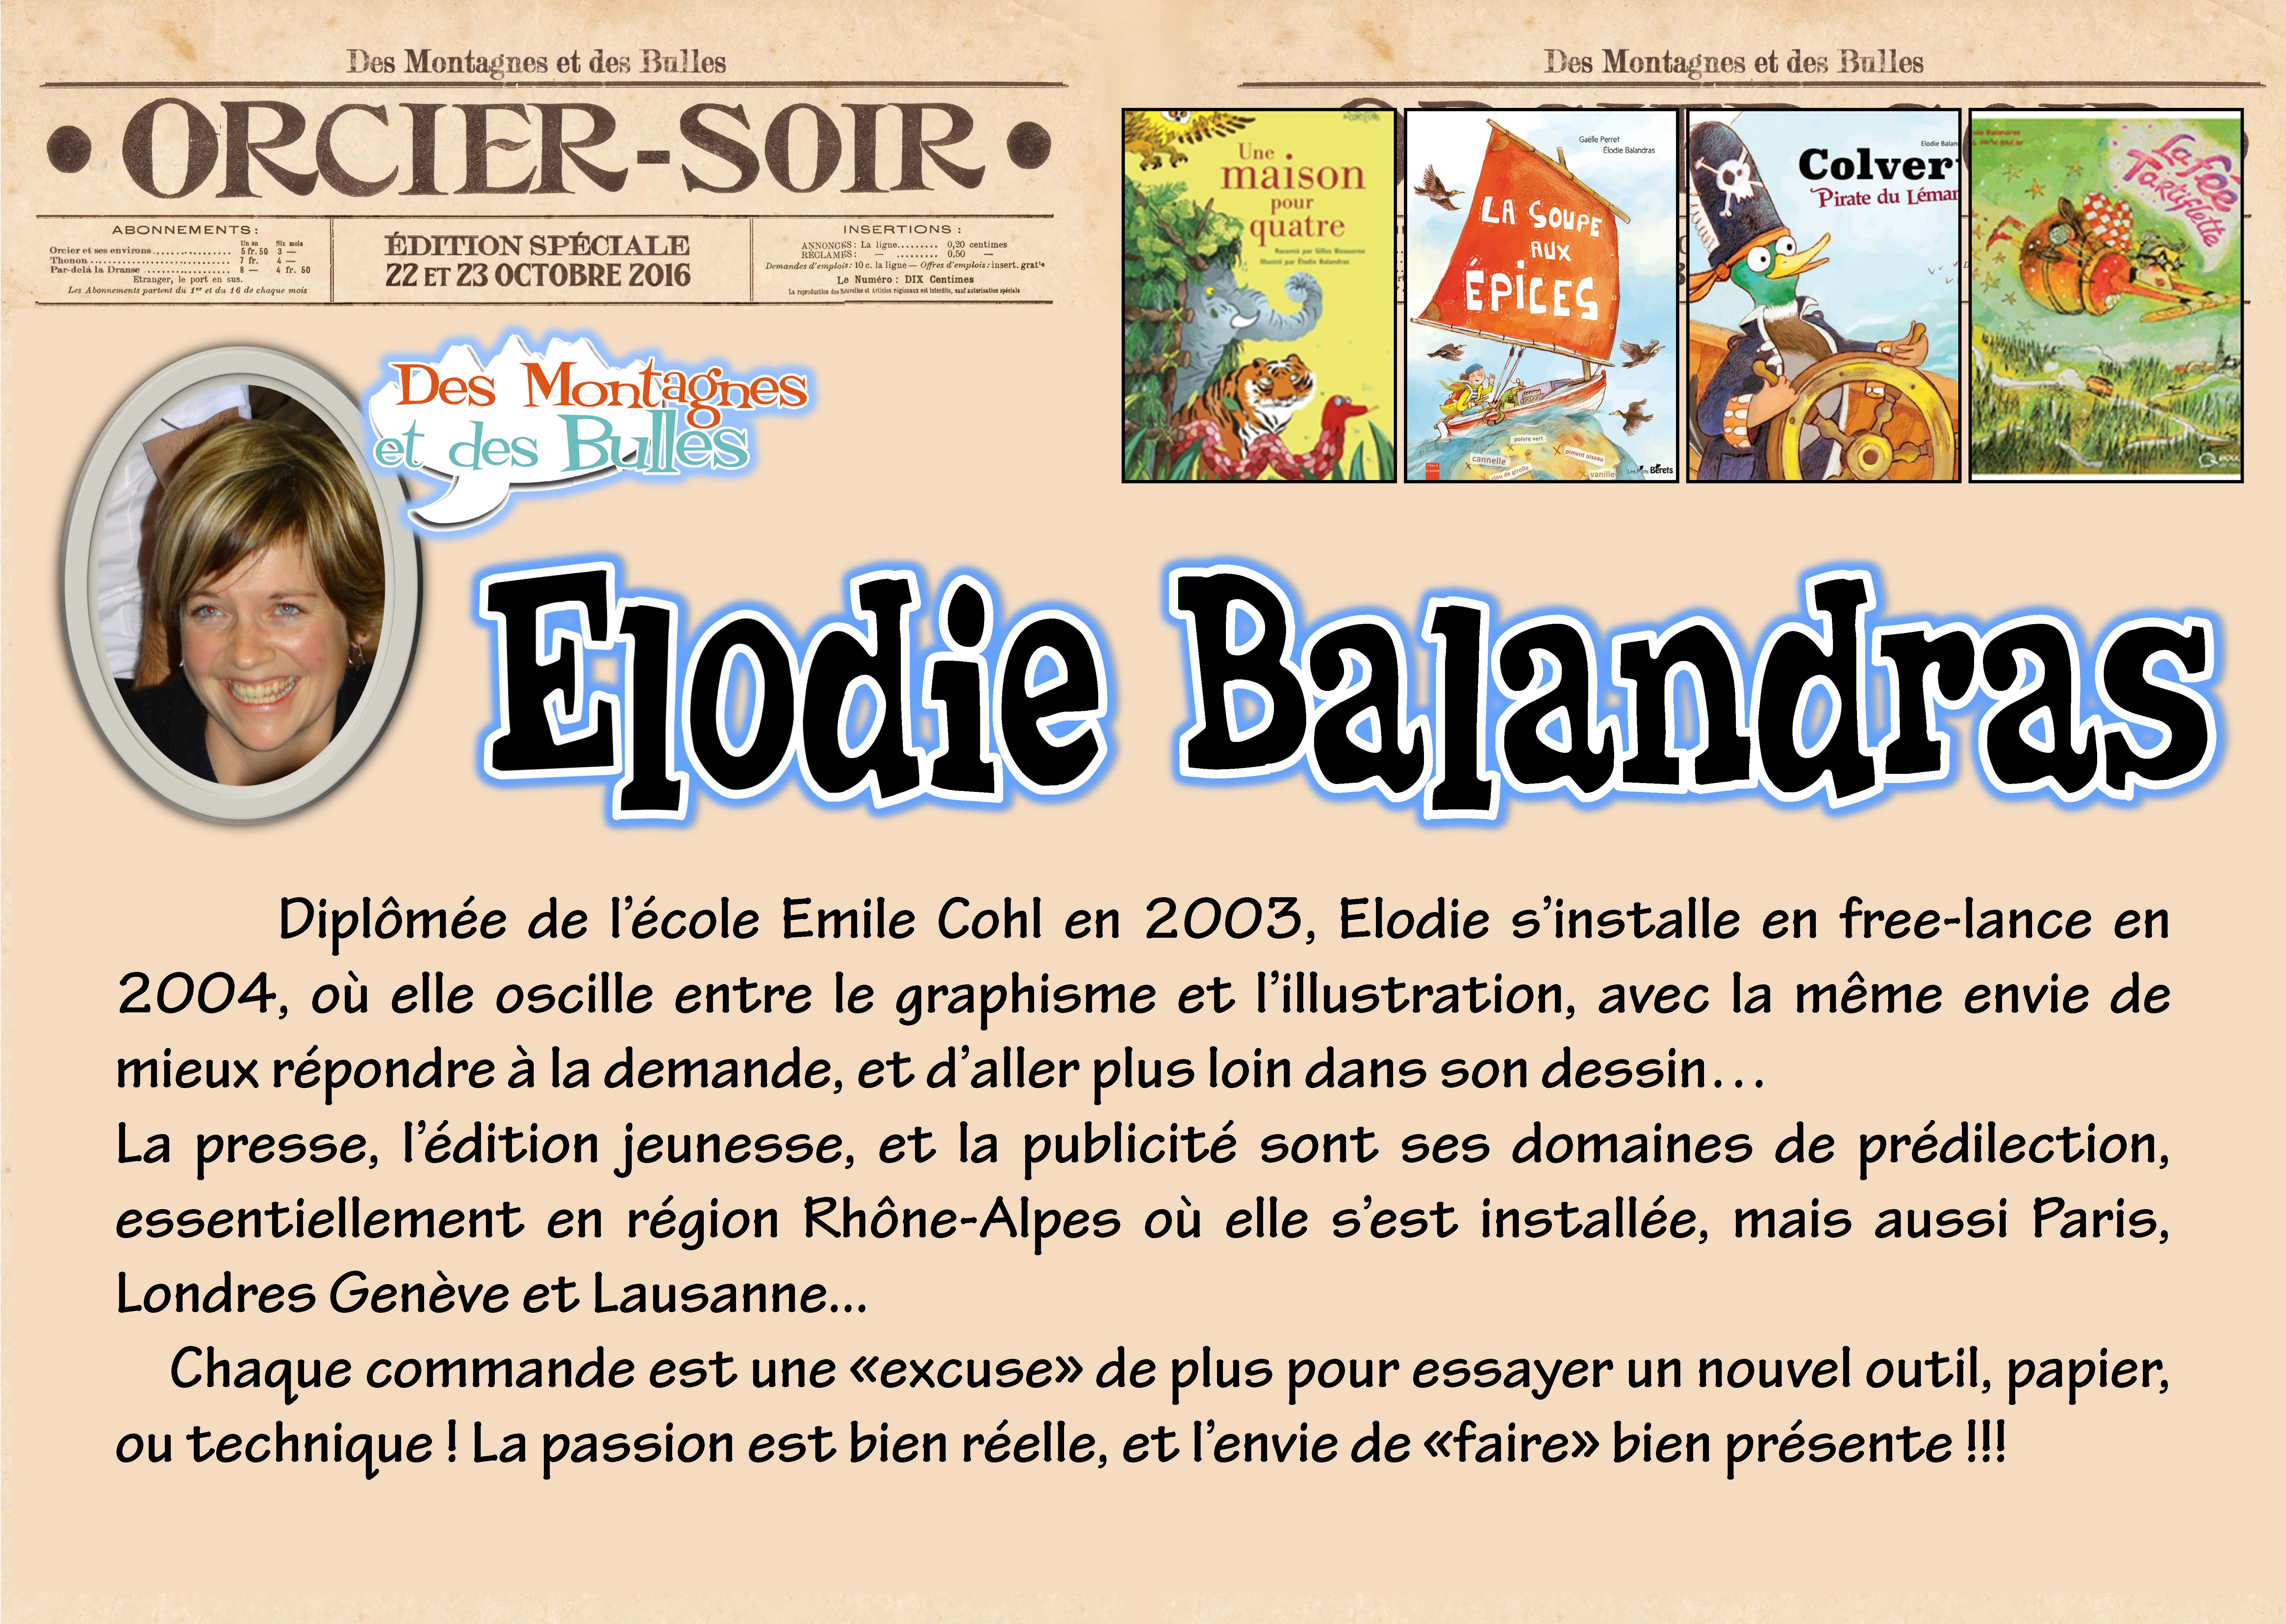 05 Elodie Balandras 2016